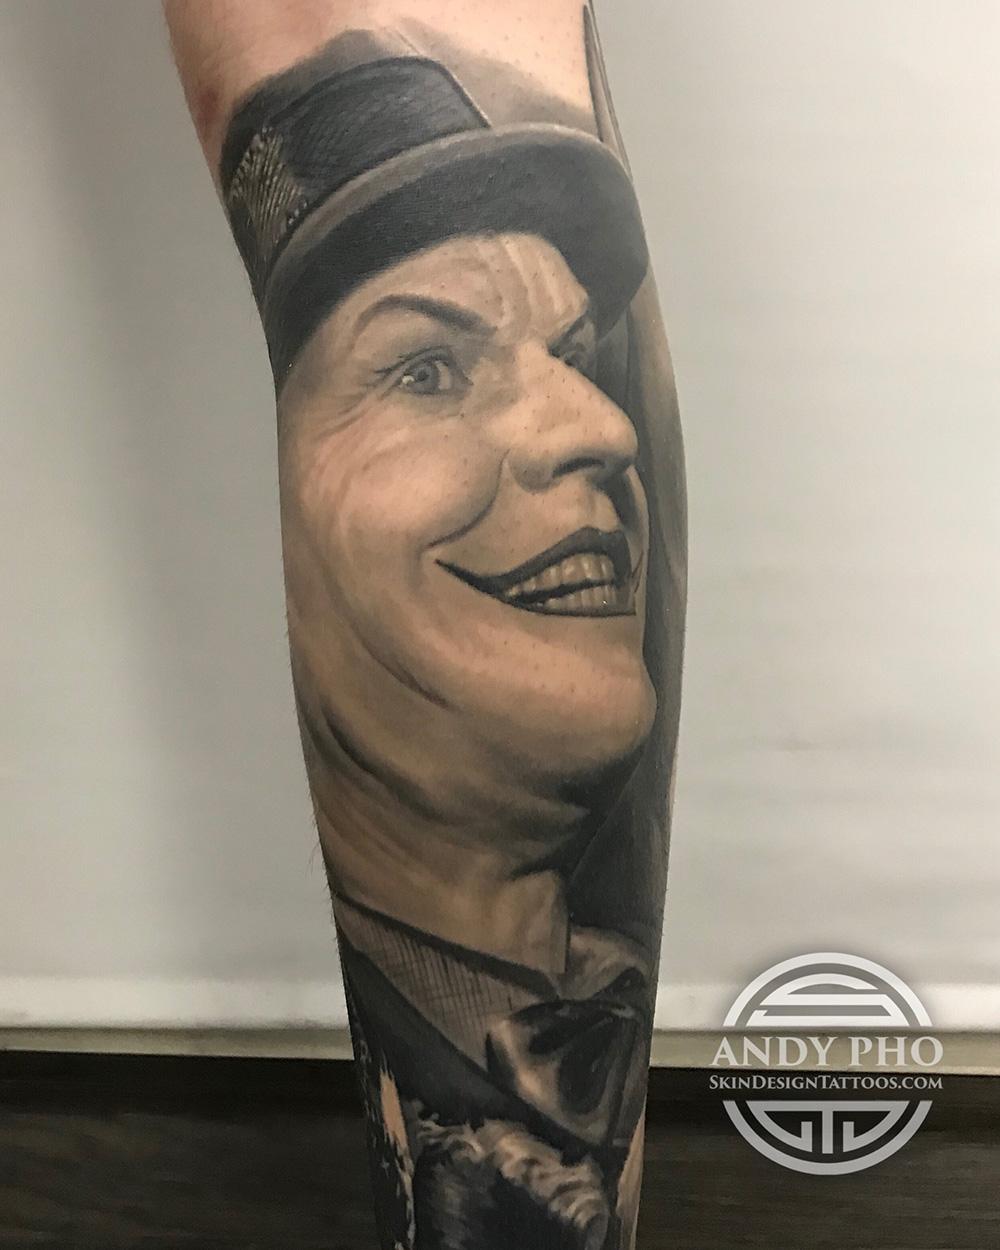 Andy Pho Joker tattoo.JPG